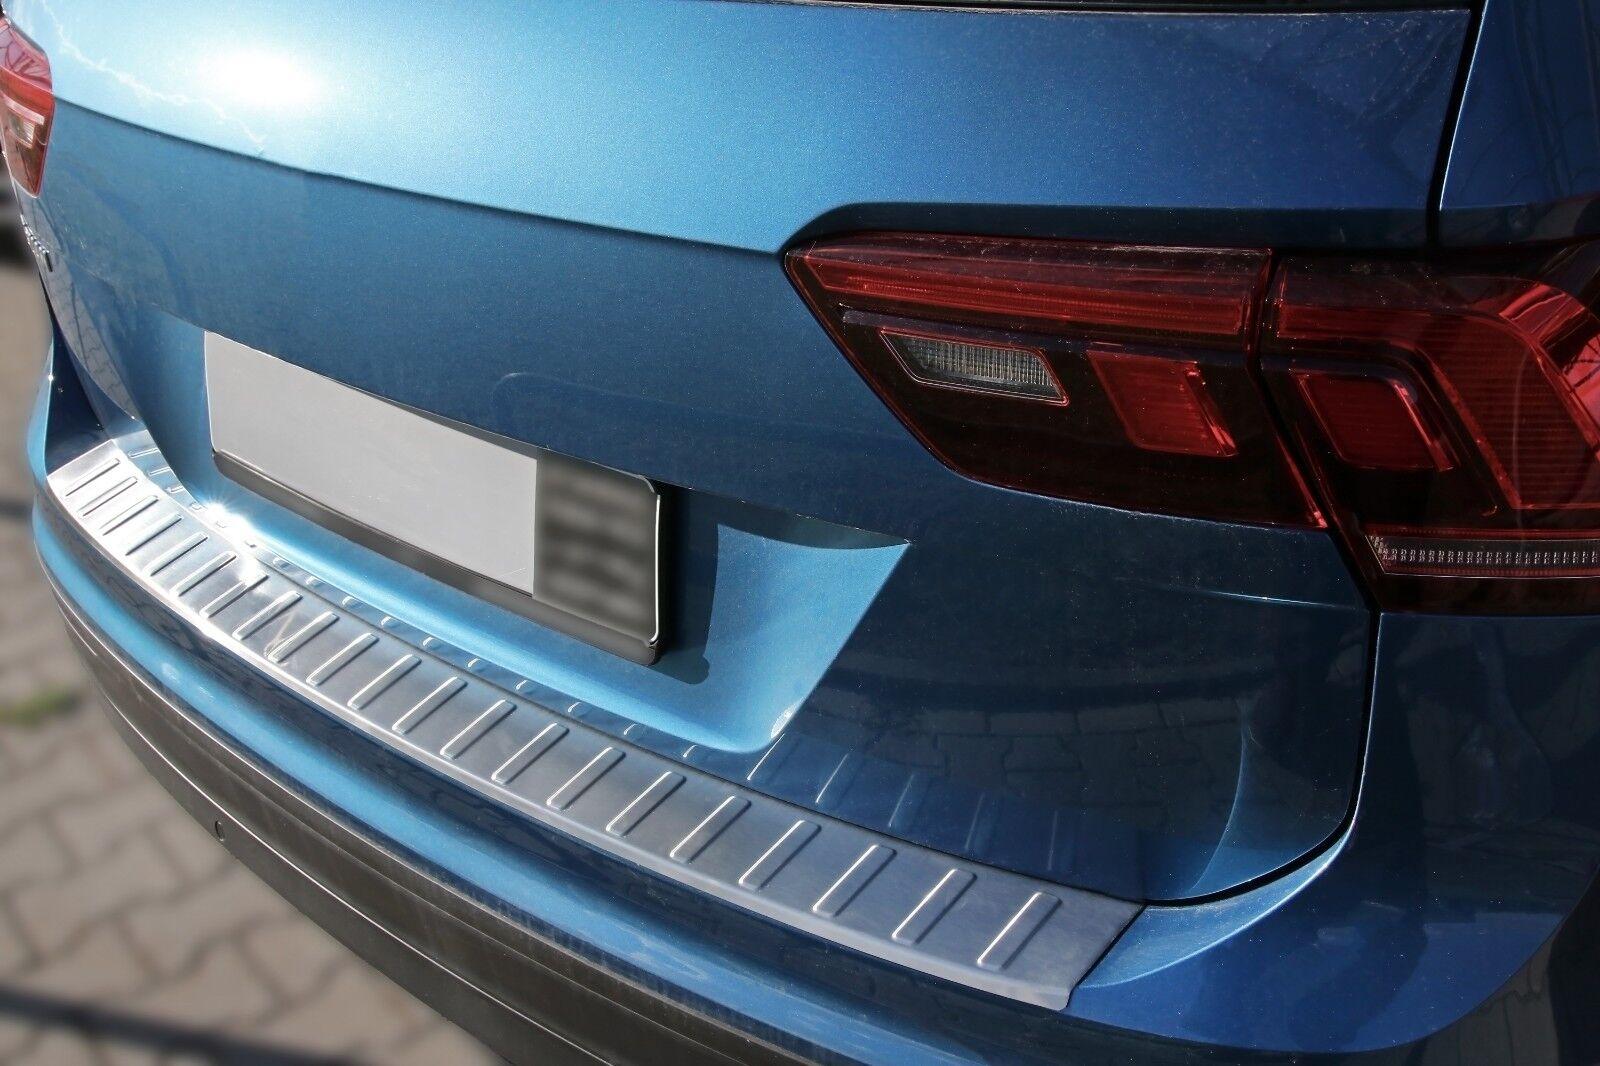 mit ABKANTUNG phil trade Edelstahl MATT Ladekantenschutz kompatibel f/ür Ford Edge 2016-2018